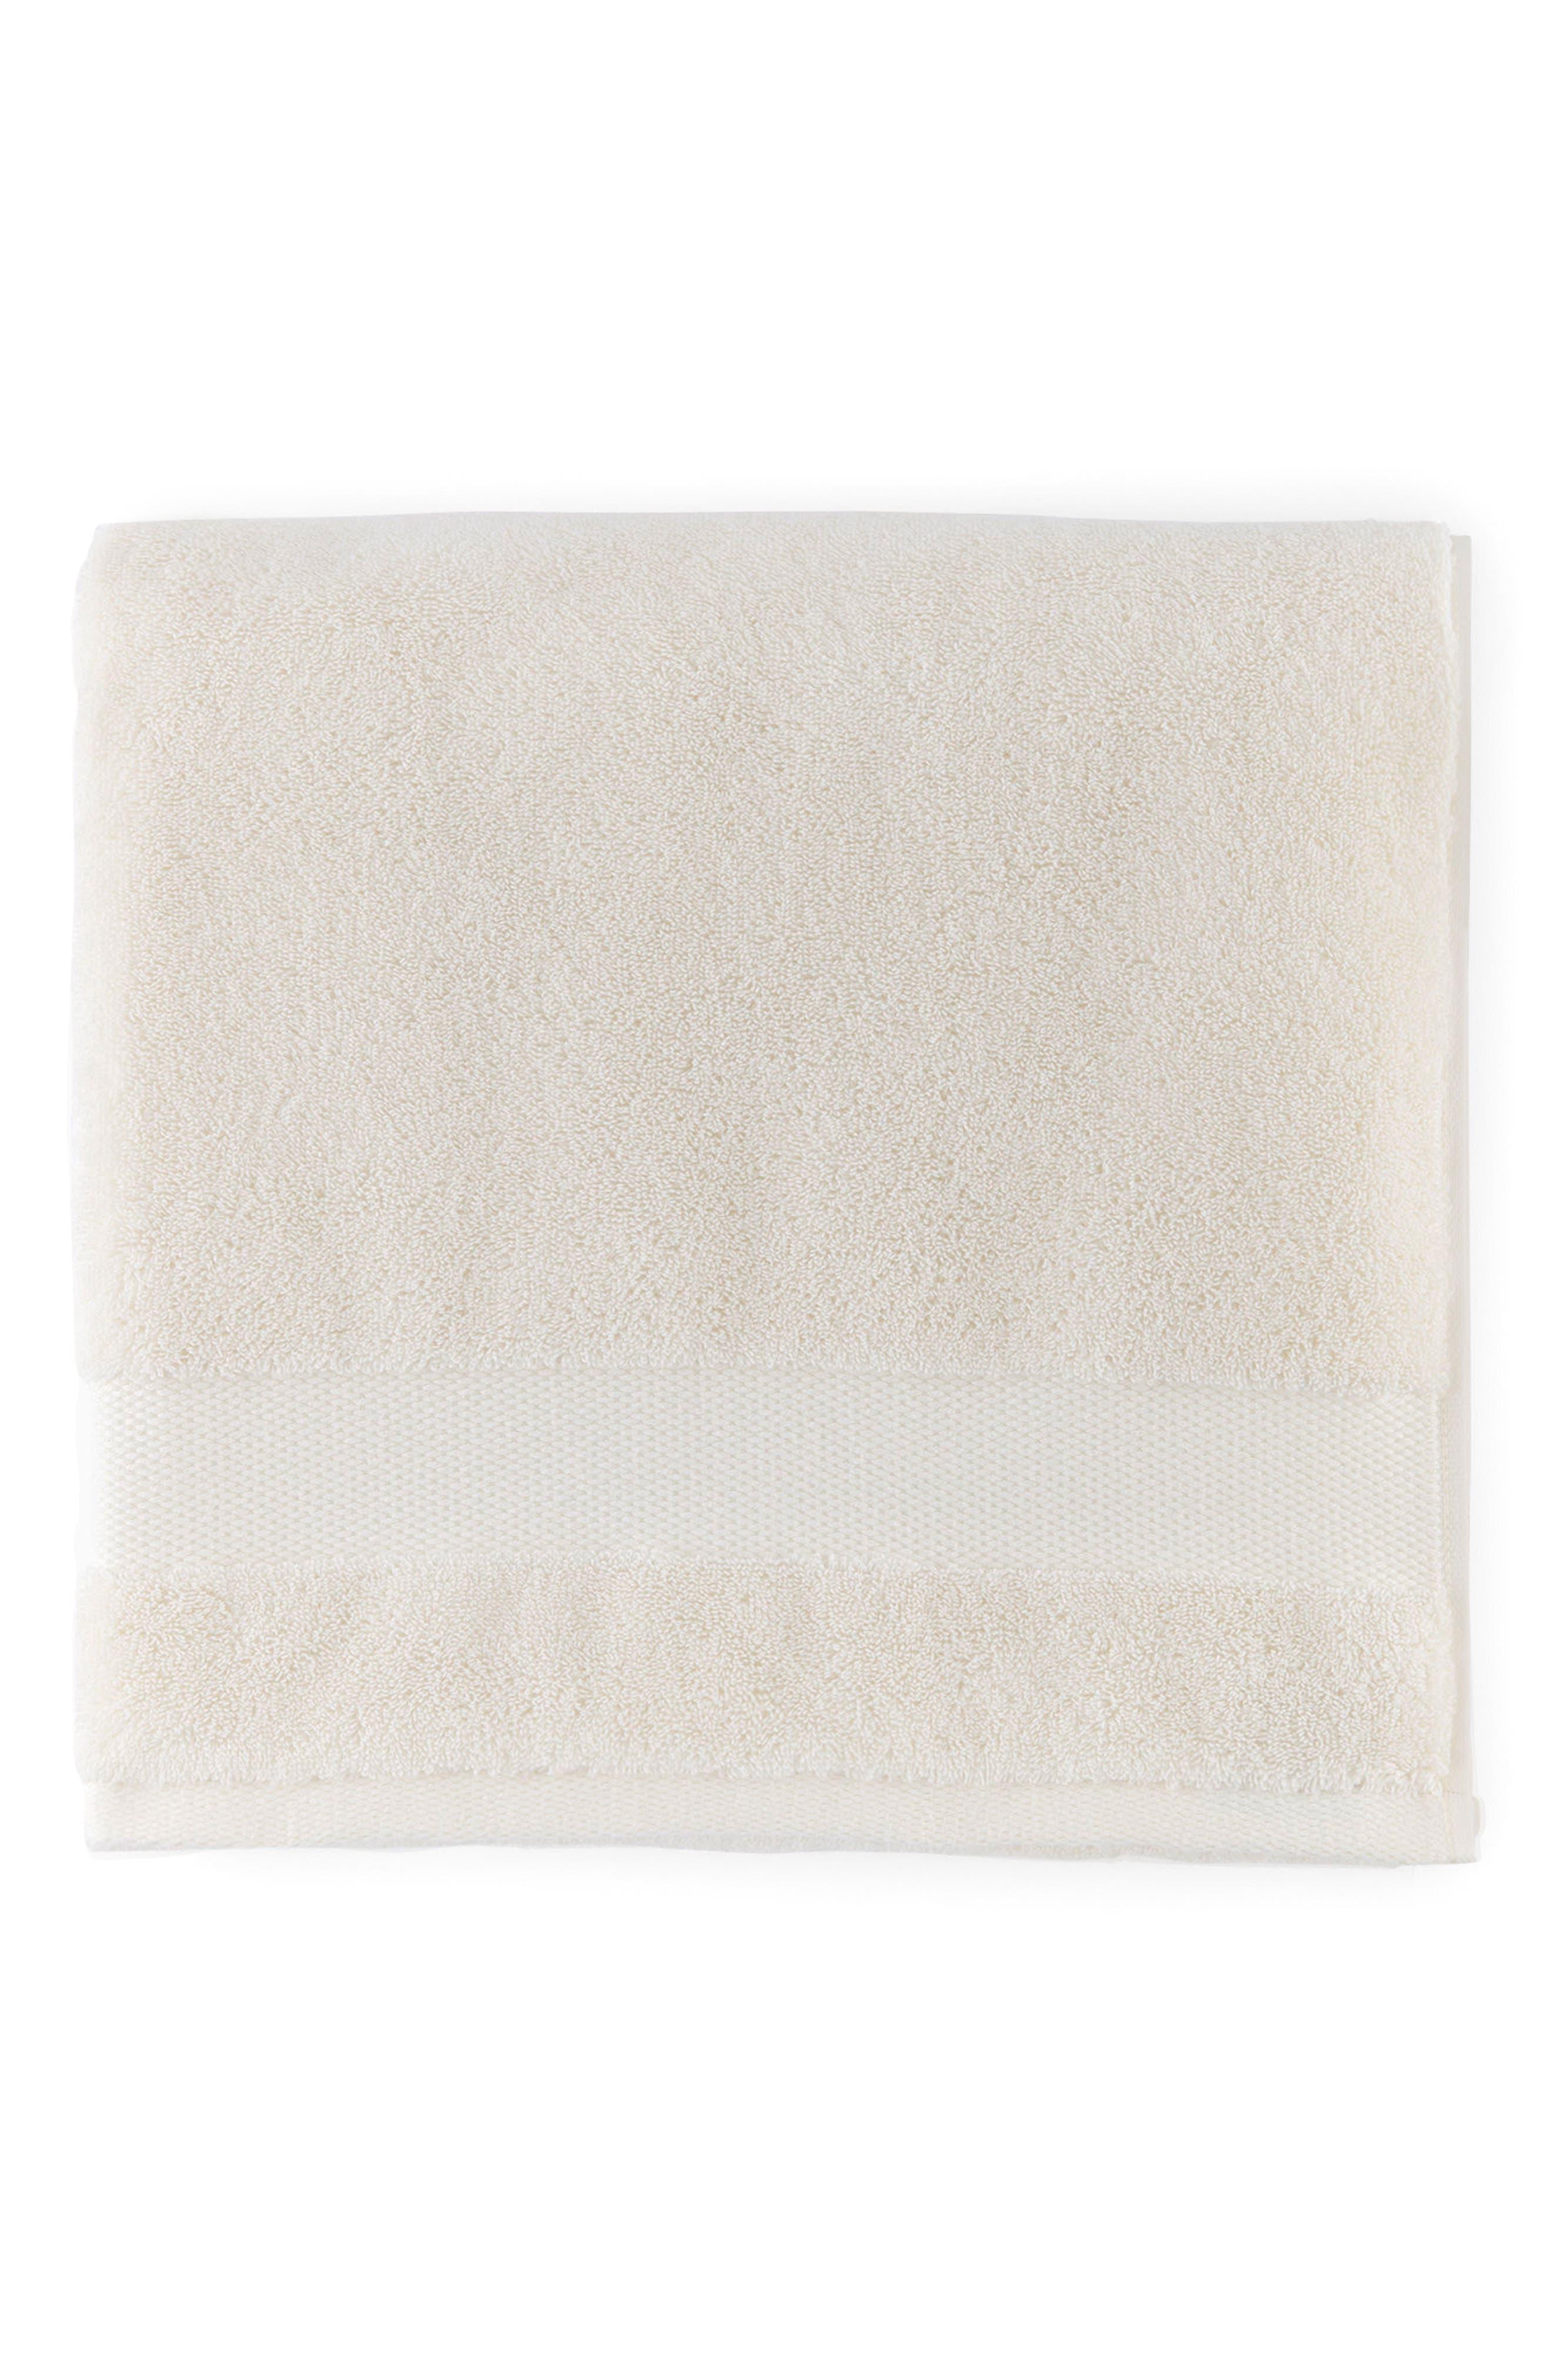 Alternate Image 1 Selected - SFERRA Bello Tip Towel